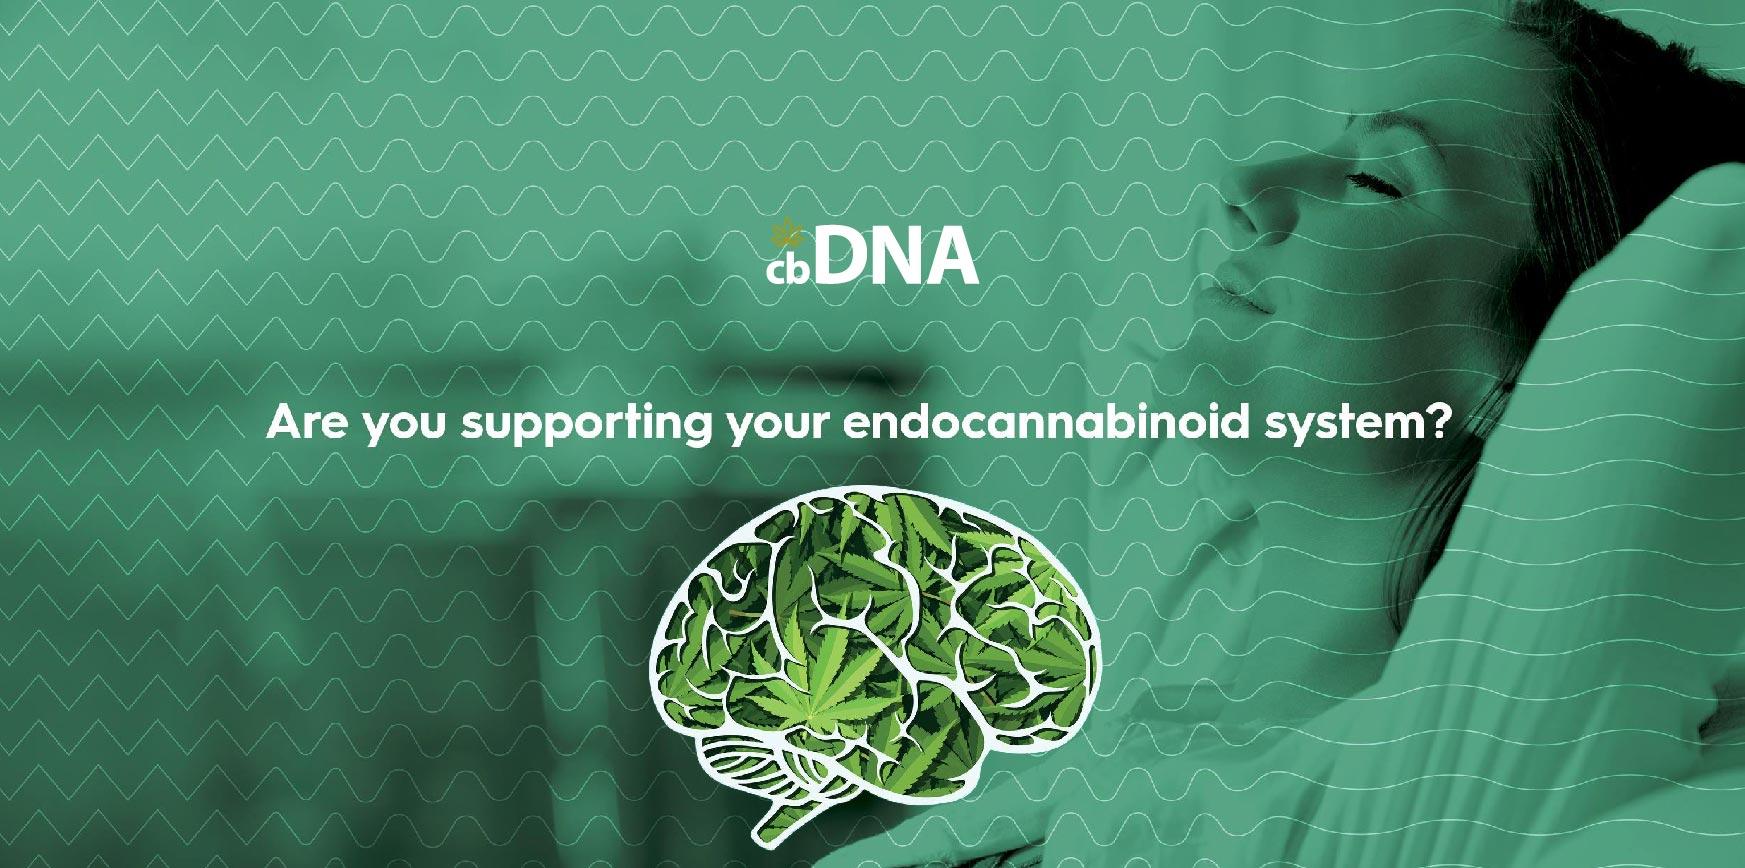 cbDNA CBD Endocannabinoid System 02